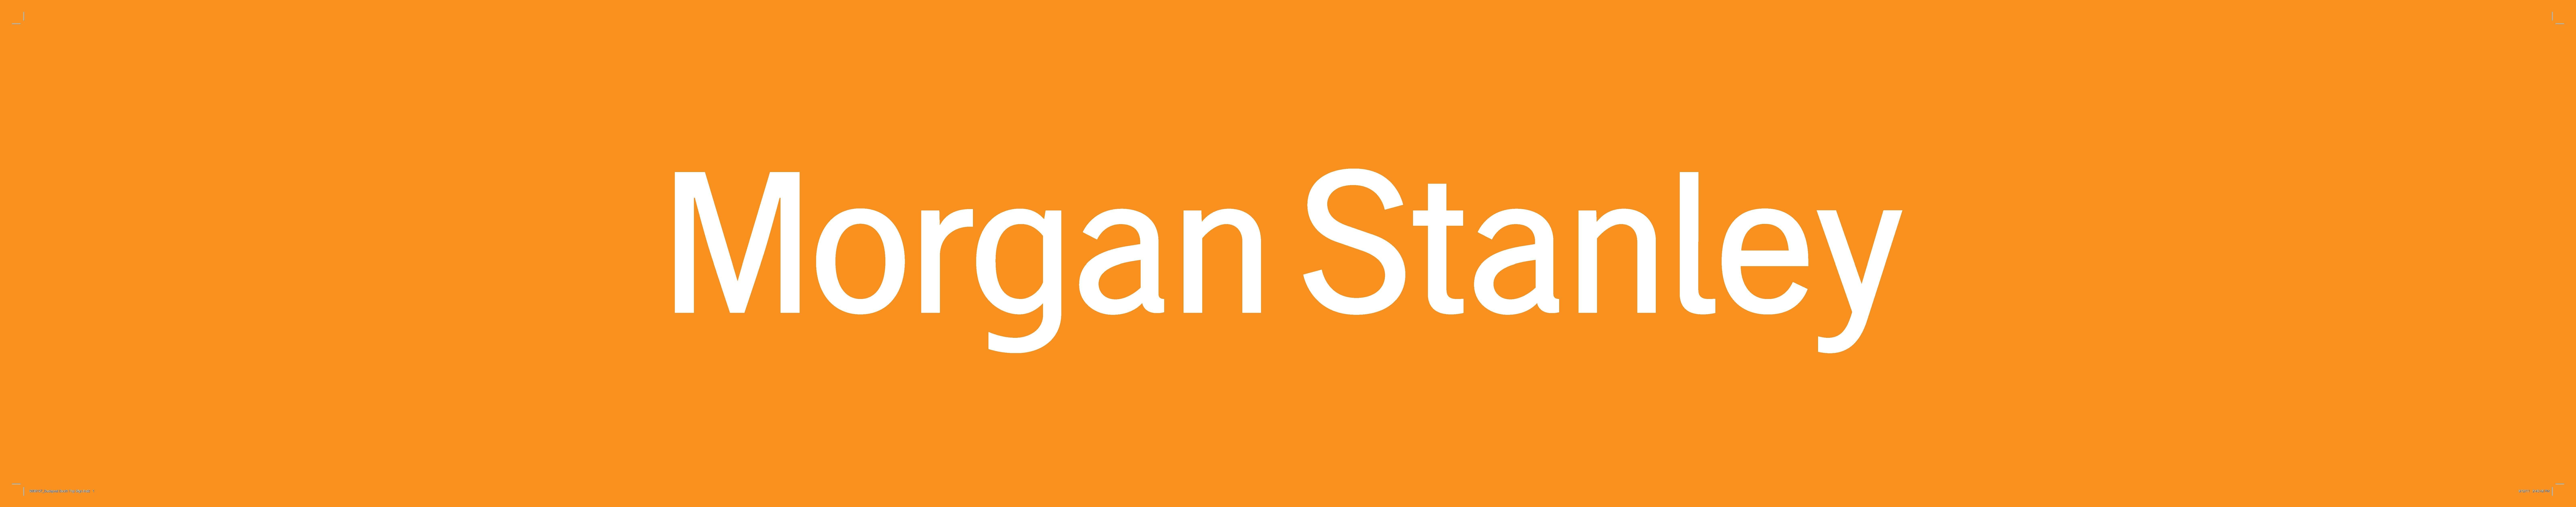 Morgan Stanley Logos